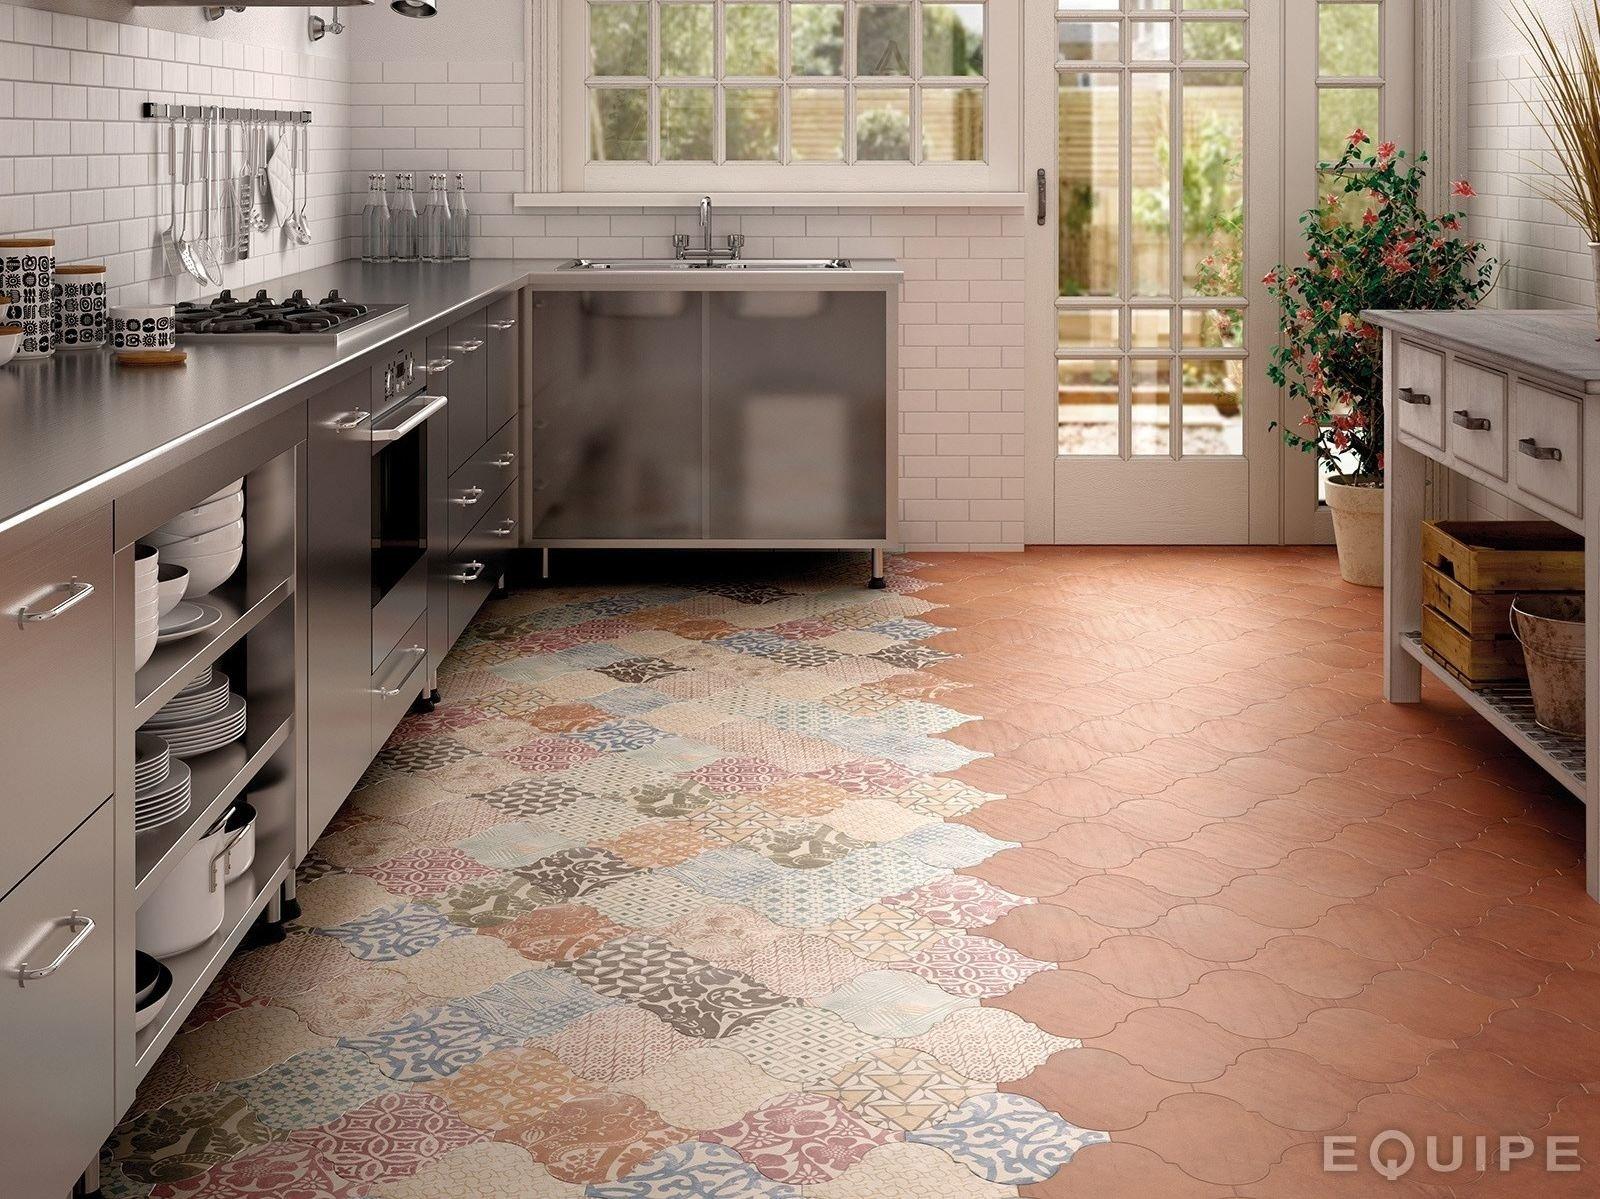 10 Fantastic Tile Flooring Ideas For Kitchen kitchen flooring merbau laminate wood look tile ideas semi gloss